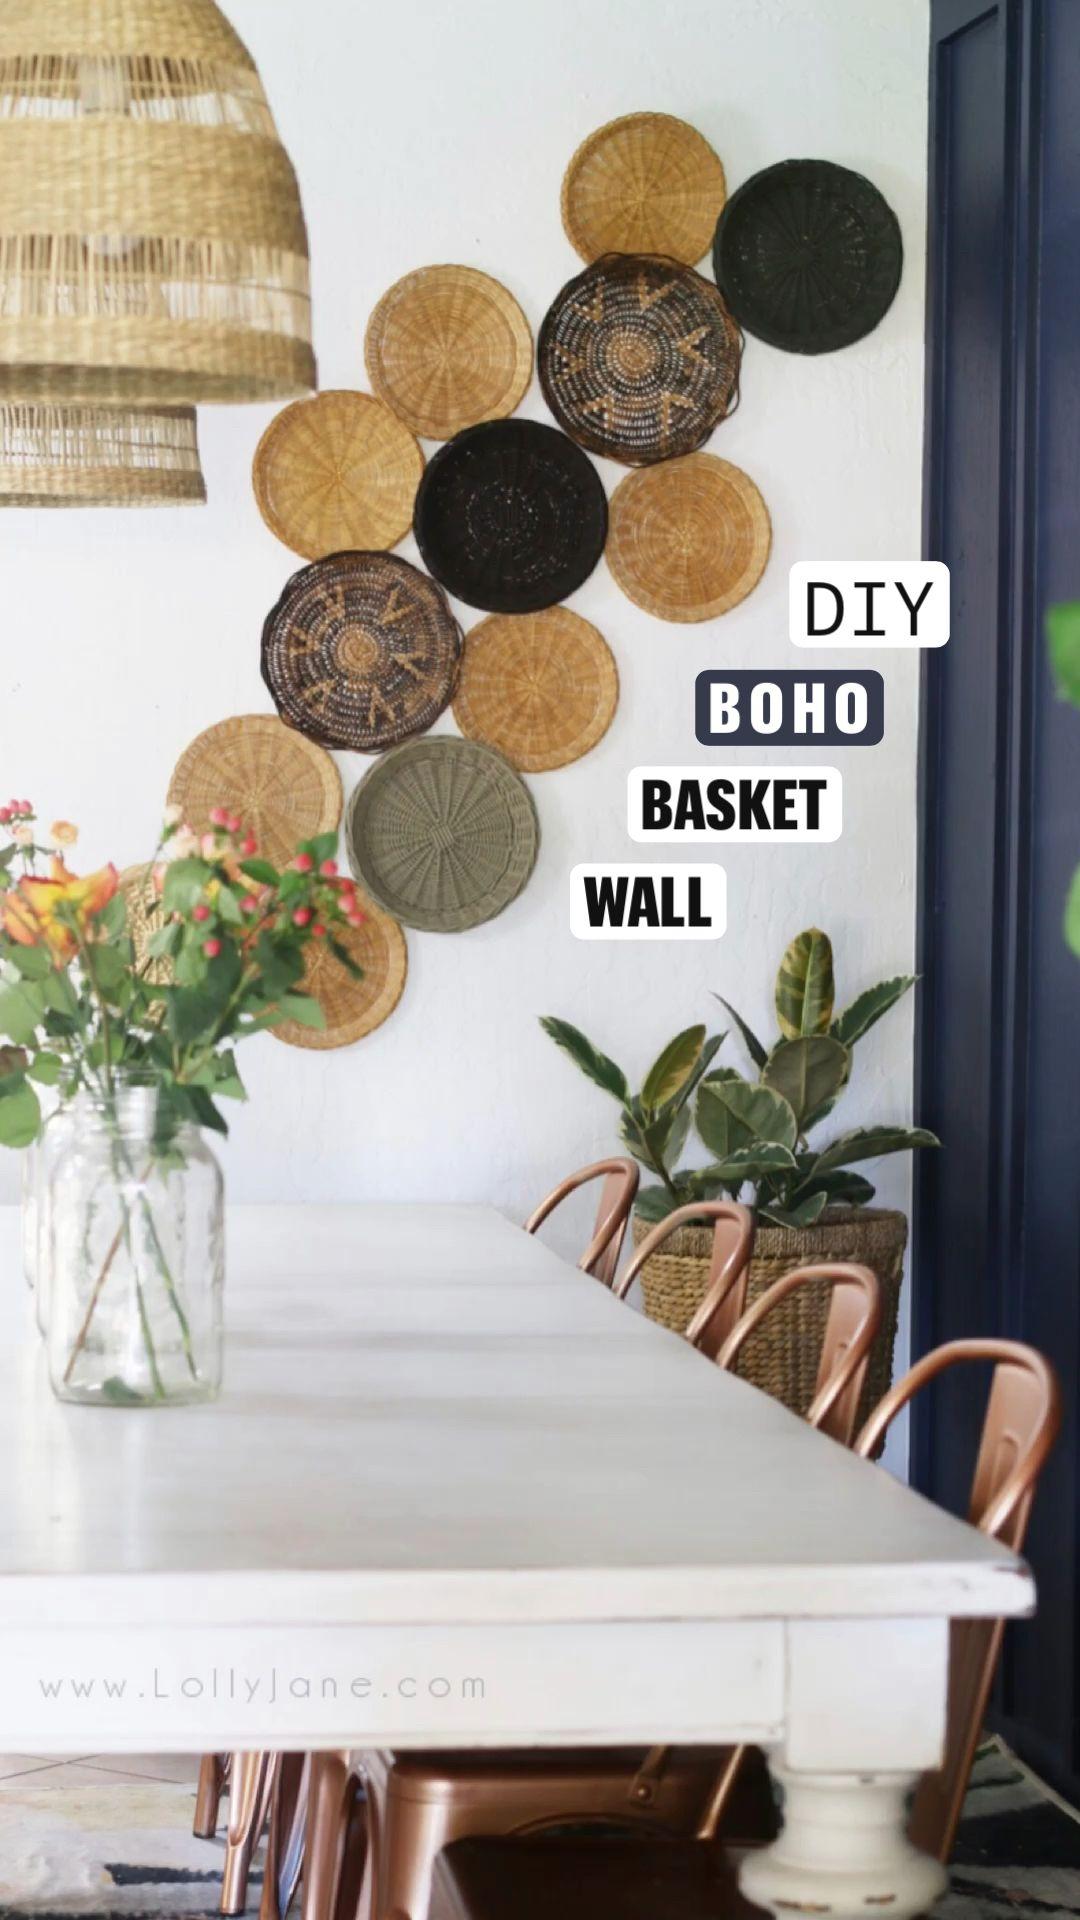 DIY Boho Basket Wall